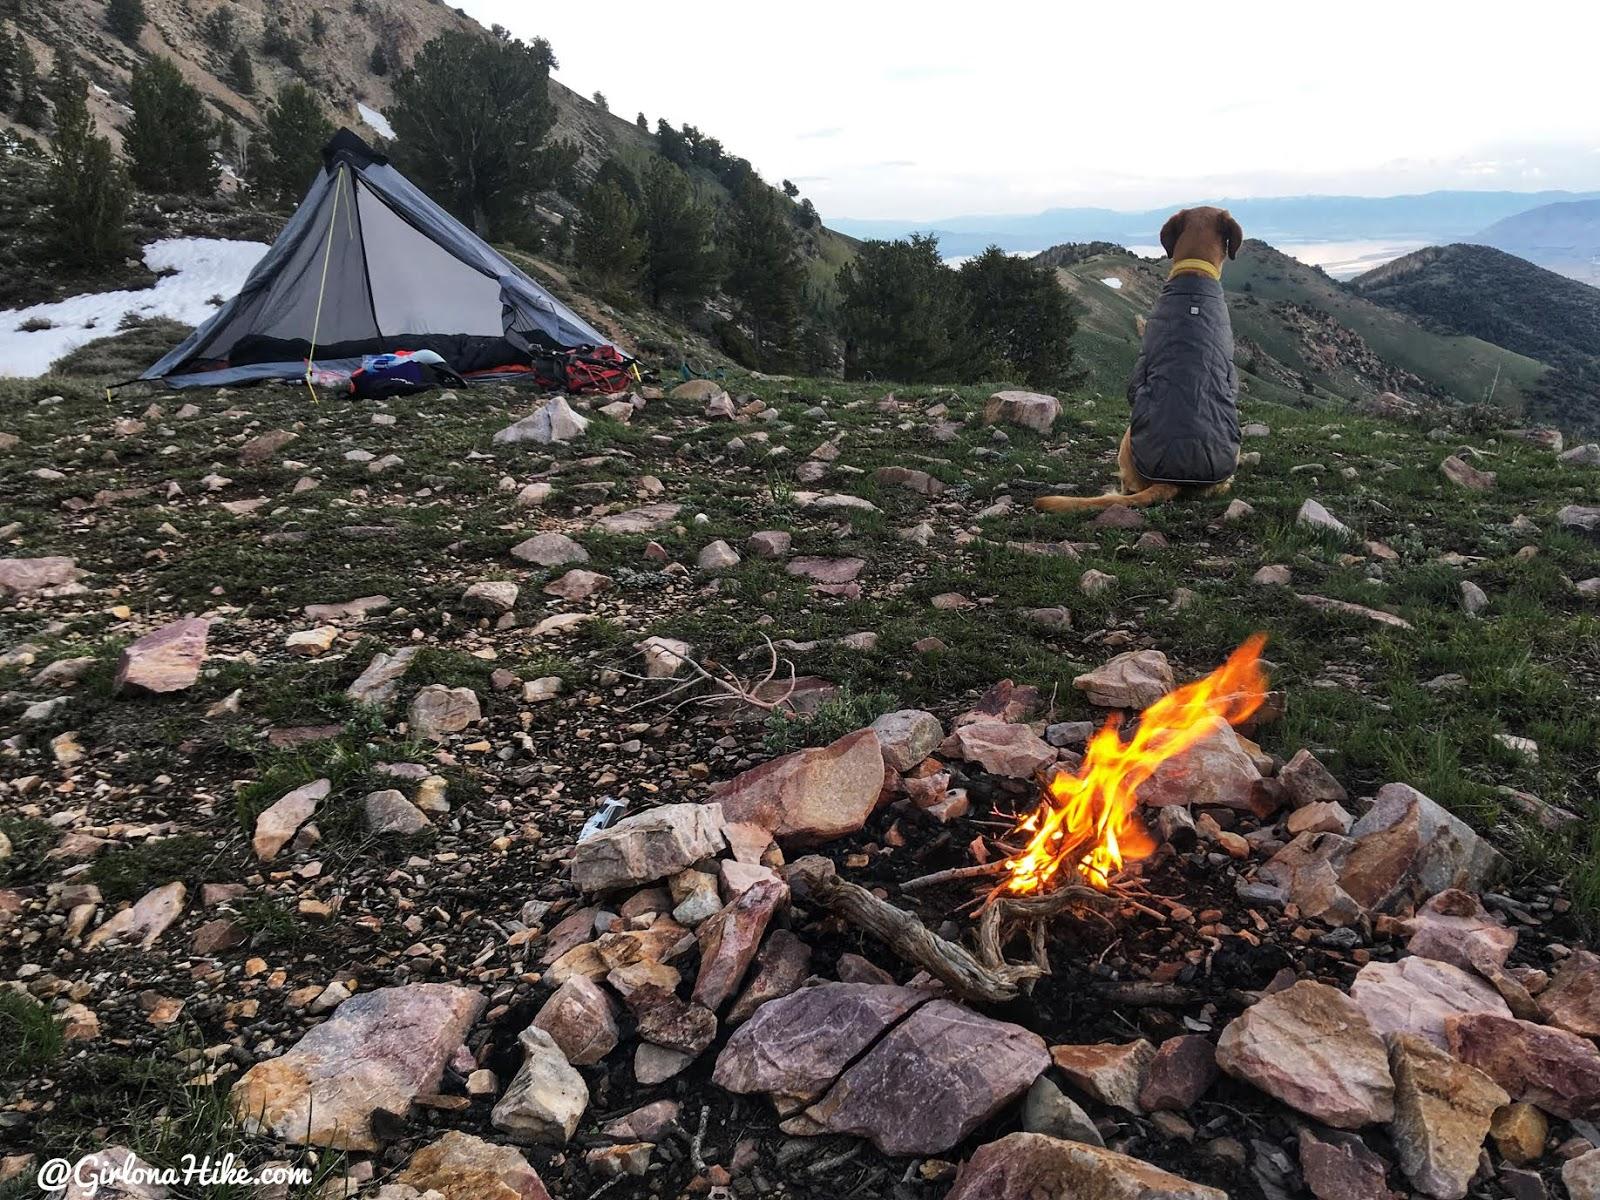 Backpacking to South Willow Lake, Desert Peak Wilderness